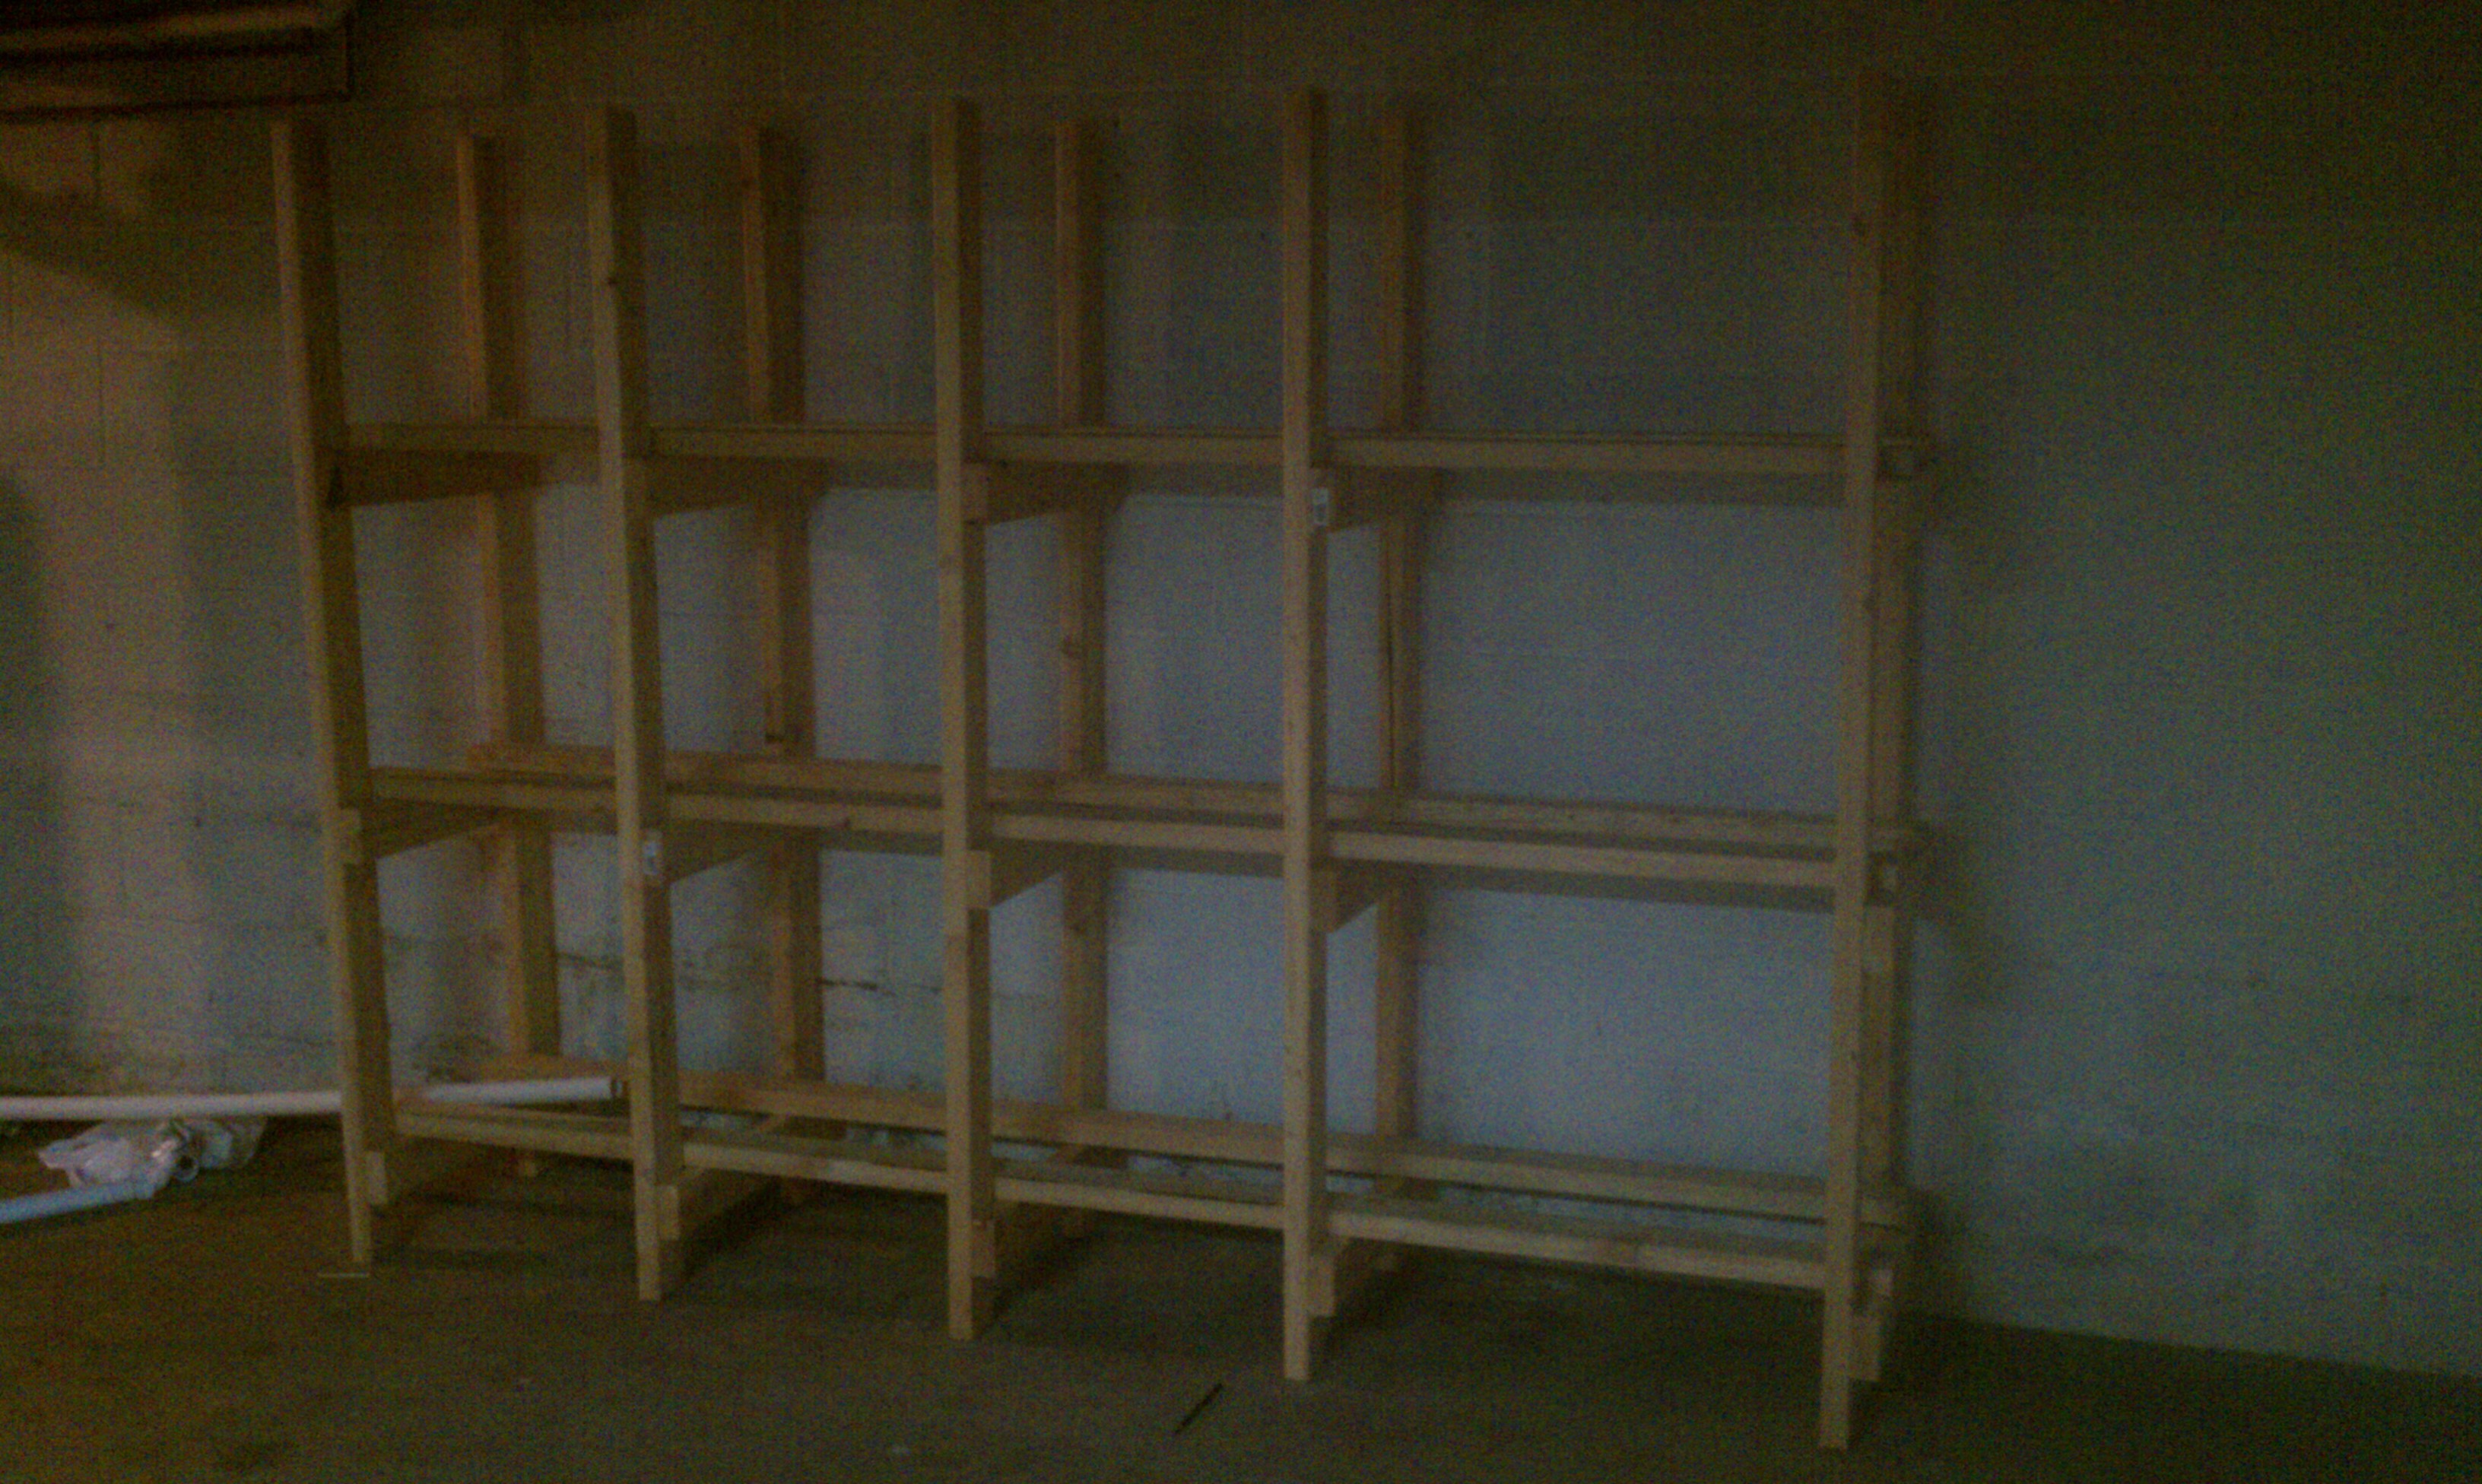 Bin storage shelving (the easy way)